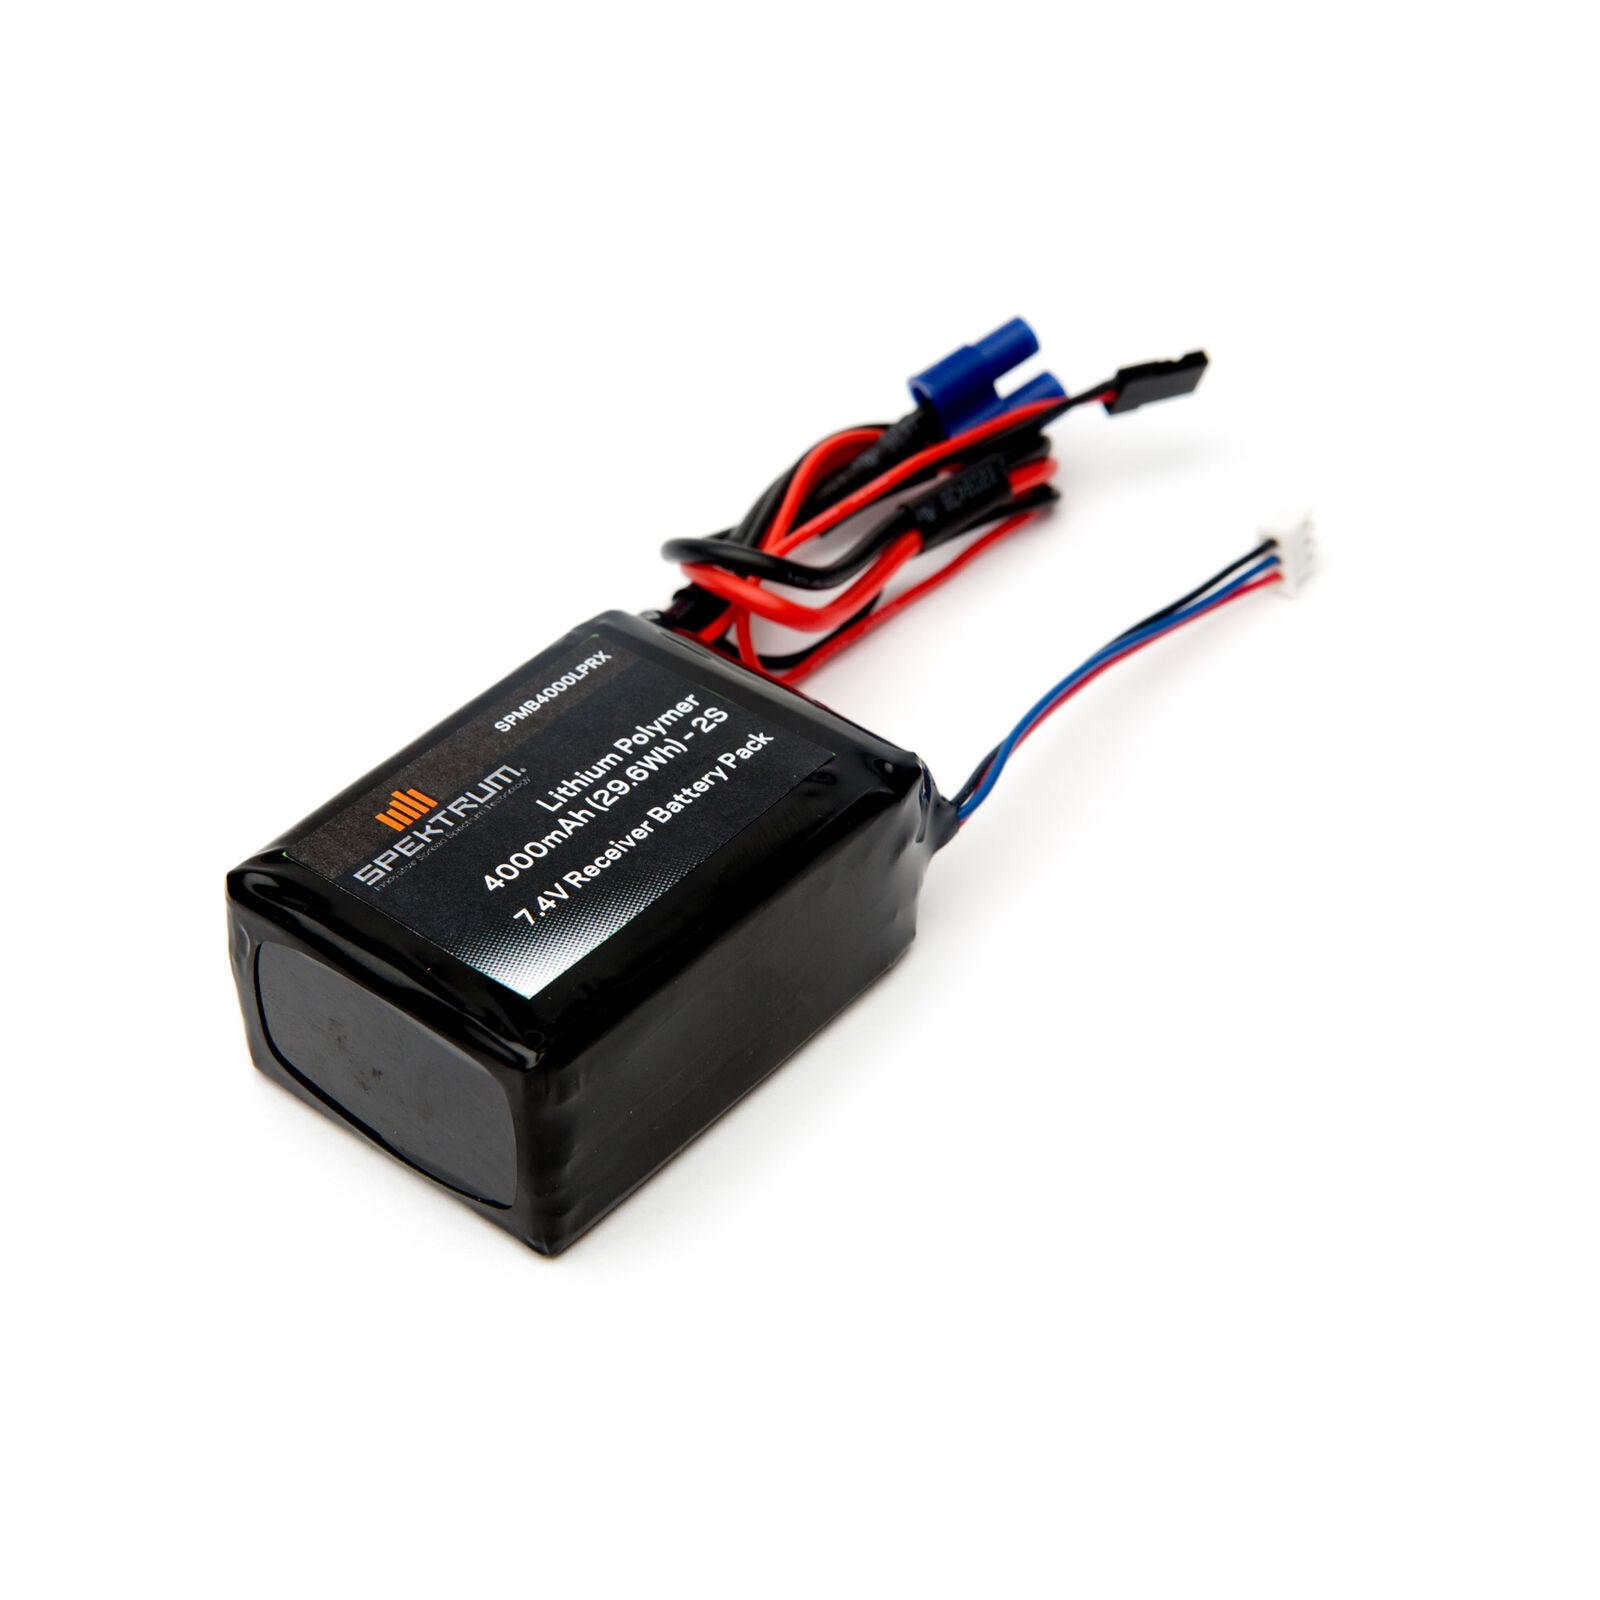 7.4V 4000mAh 2S LiPo Receiver Battery: Universal Receiver, EC3